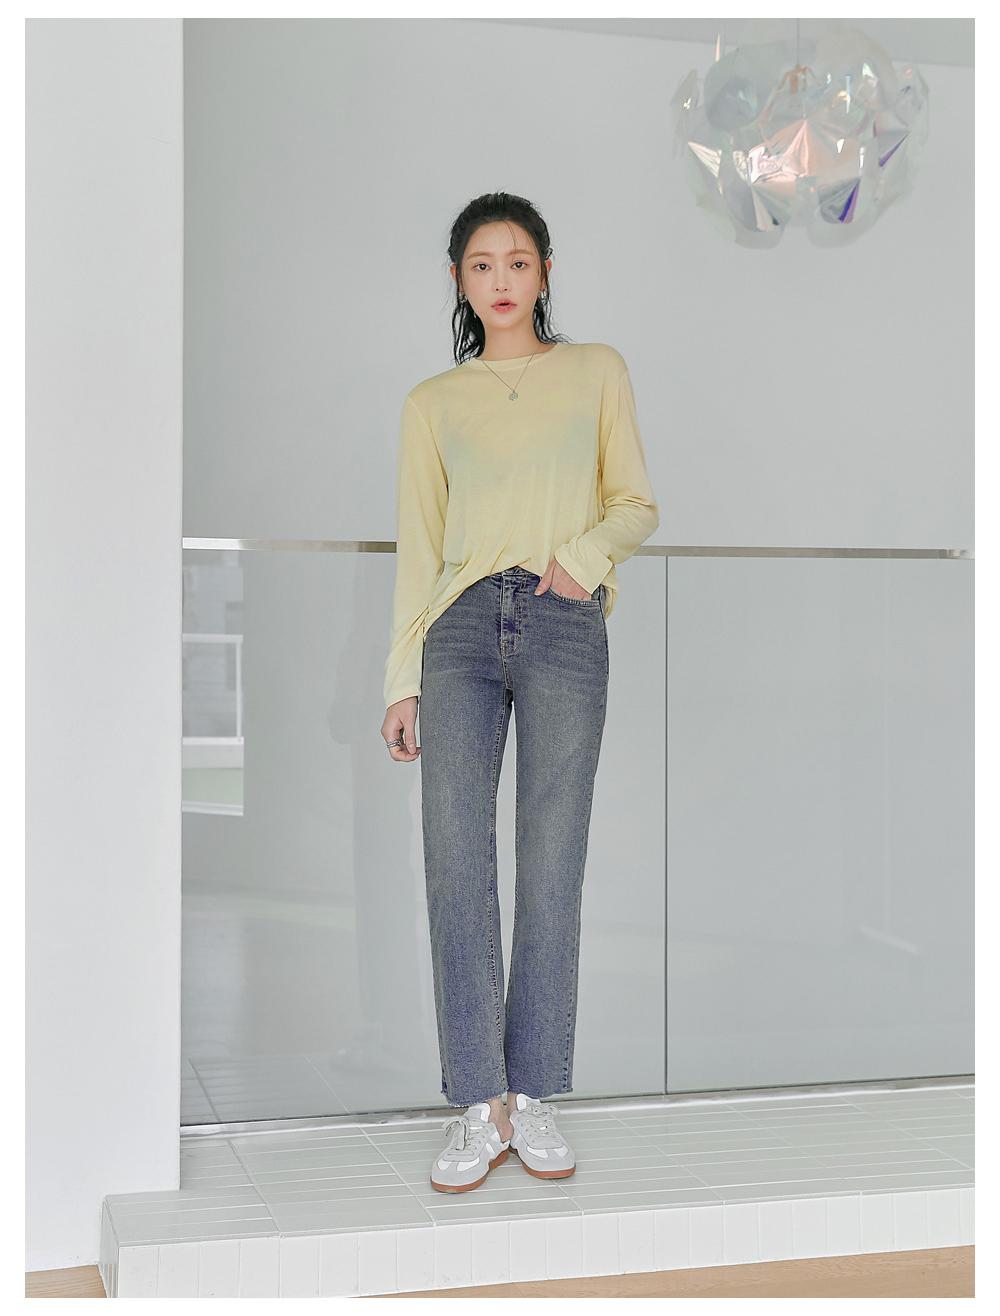 dress model image-S1L7